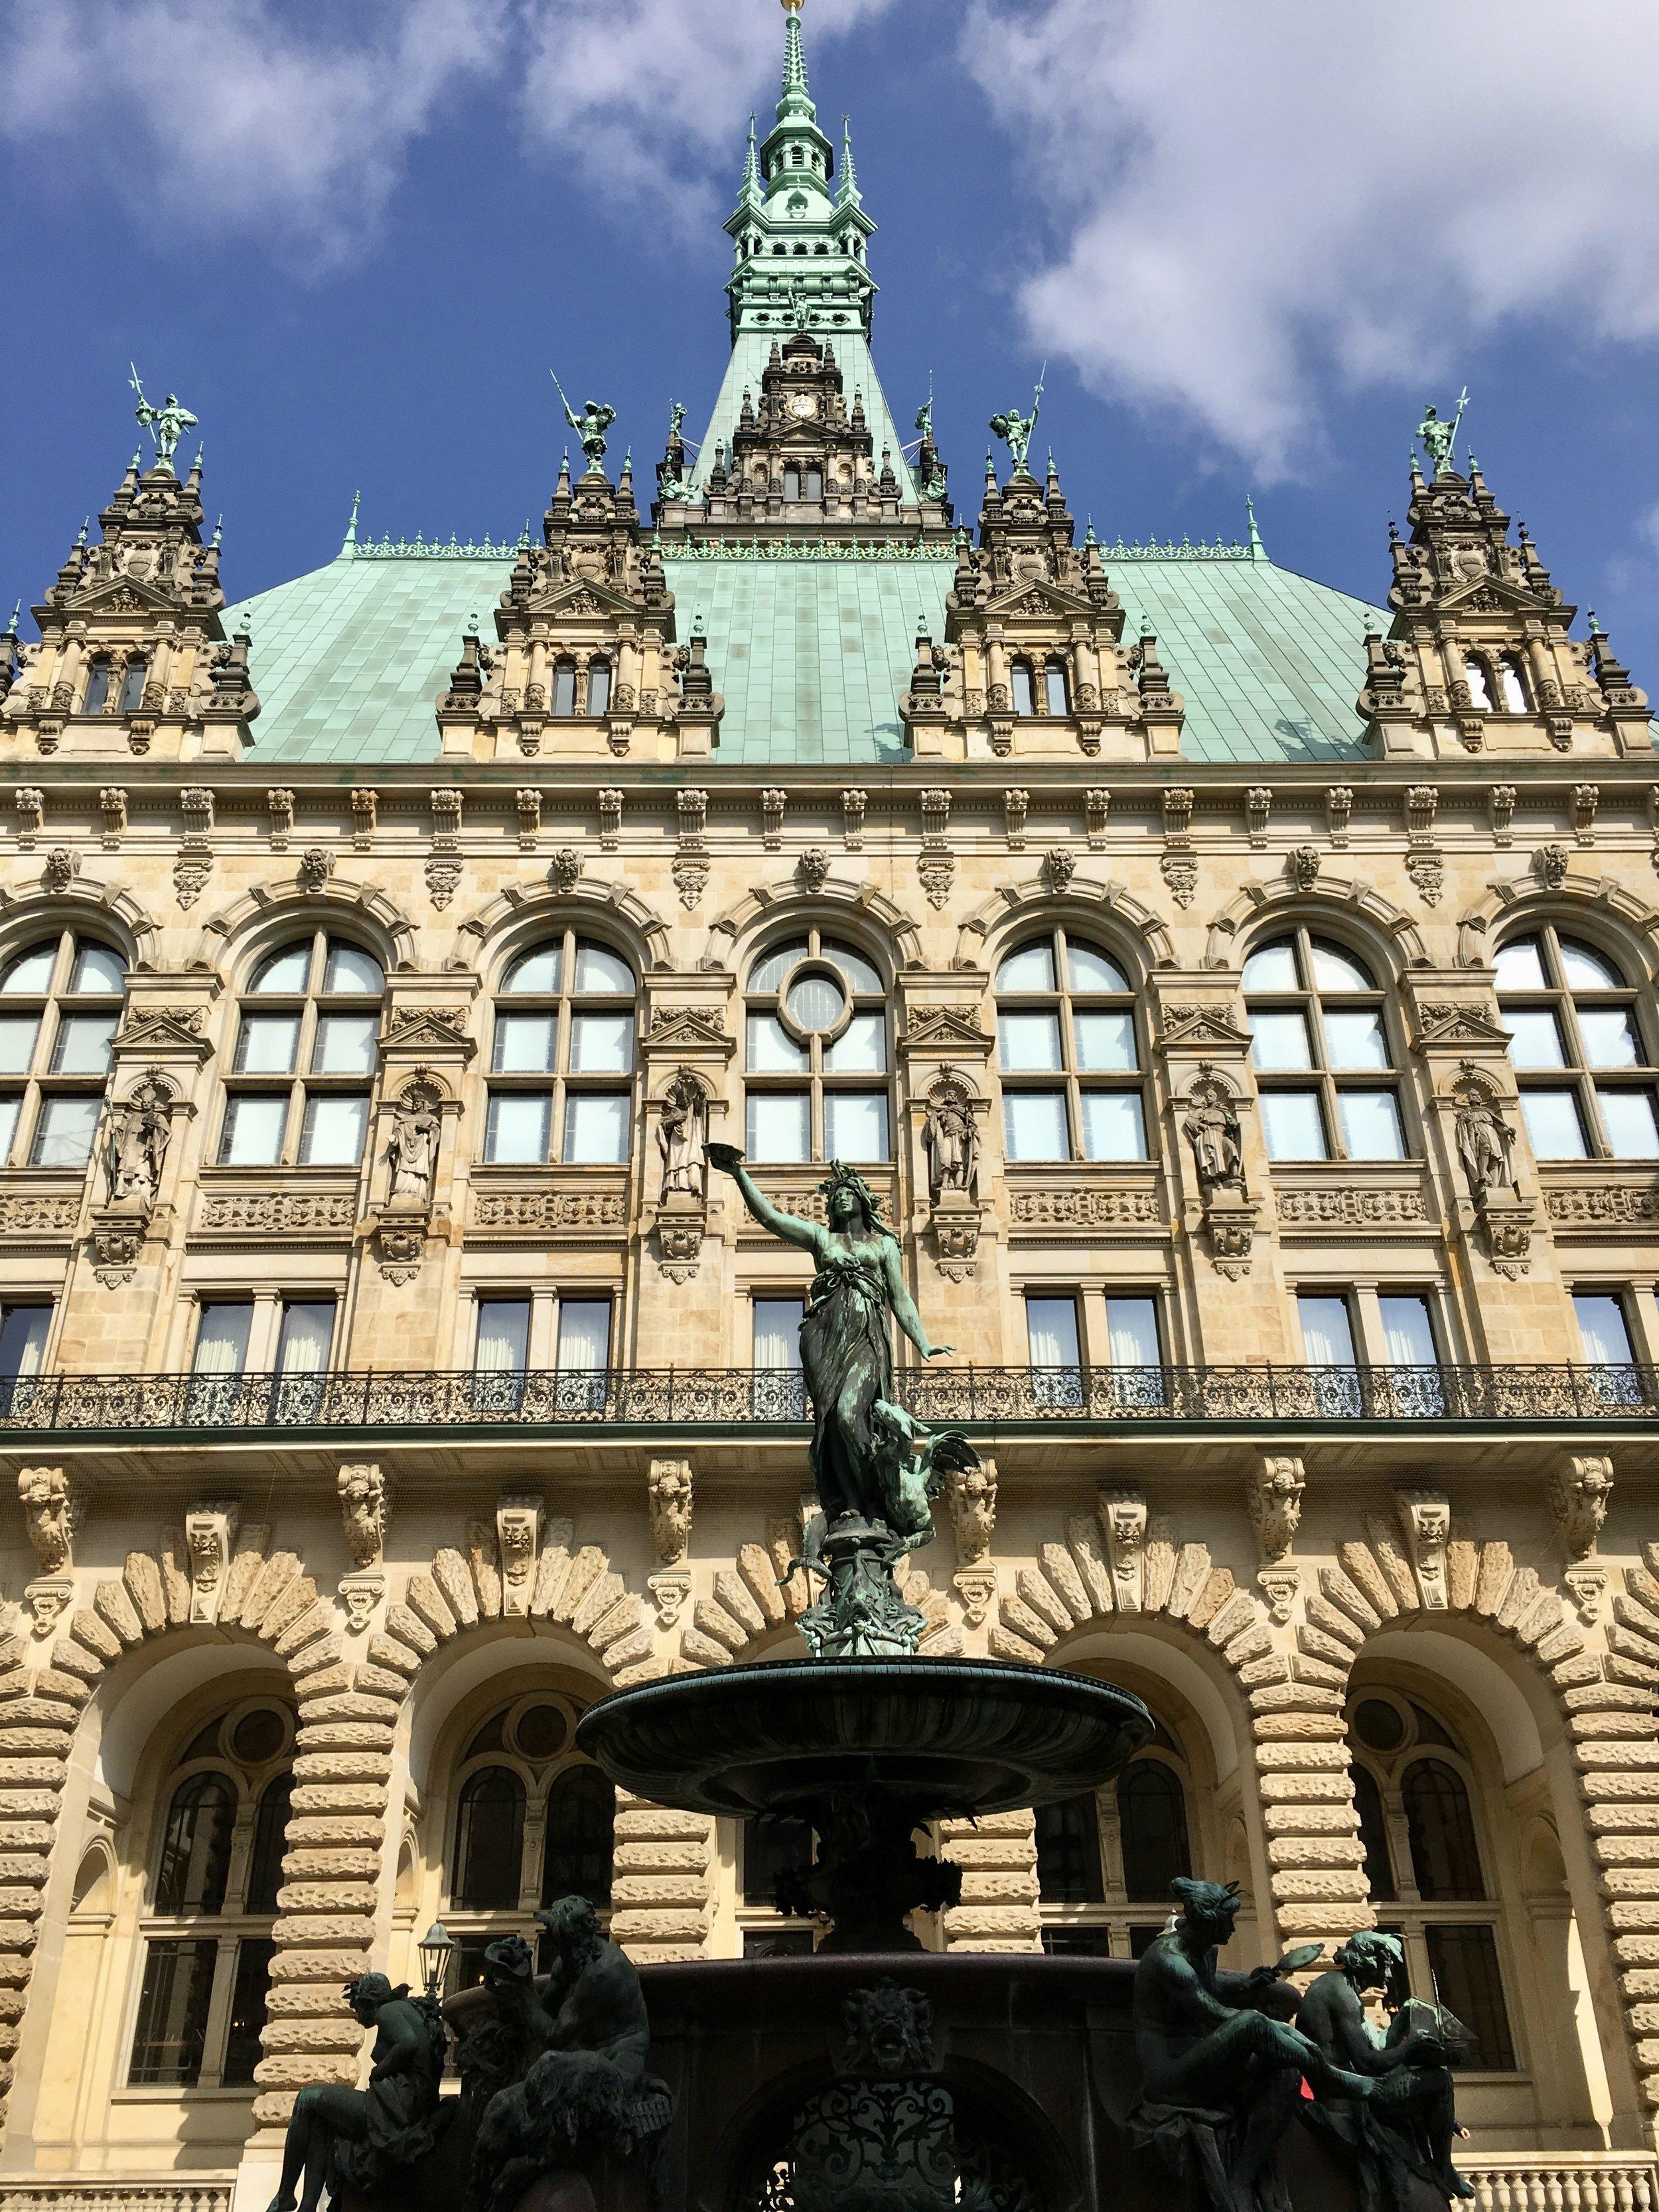 The impressive Rathaus, or City Hall